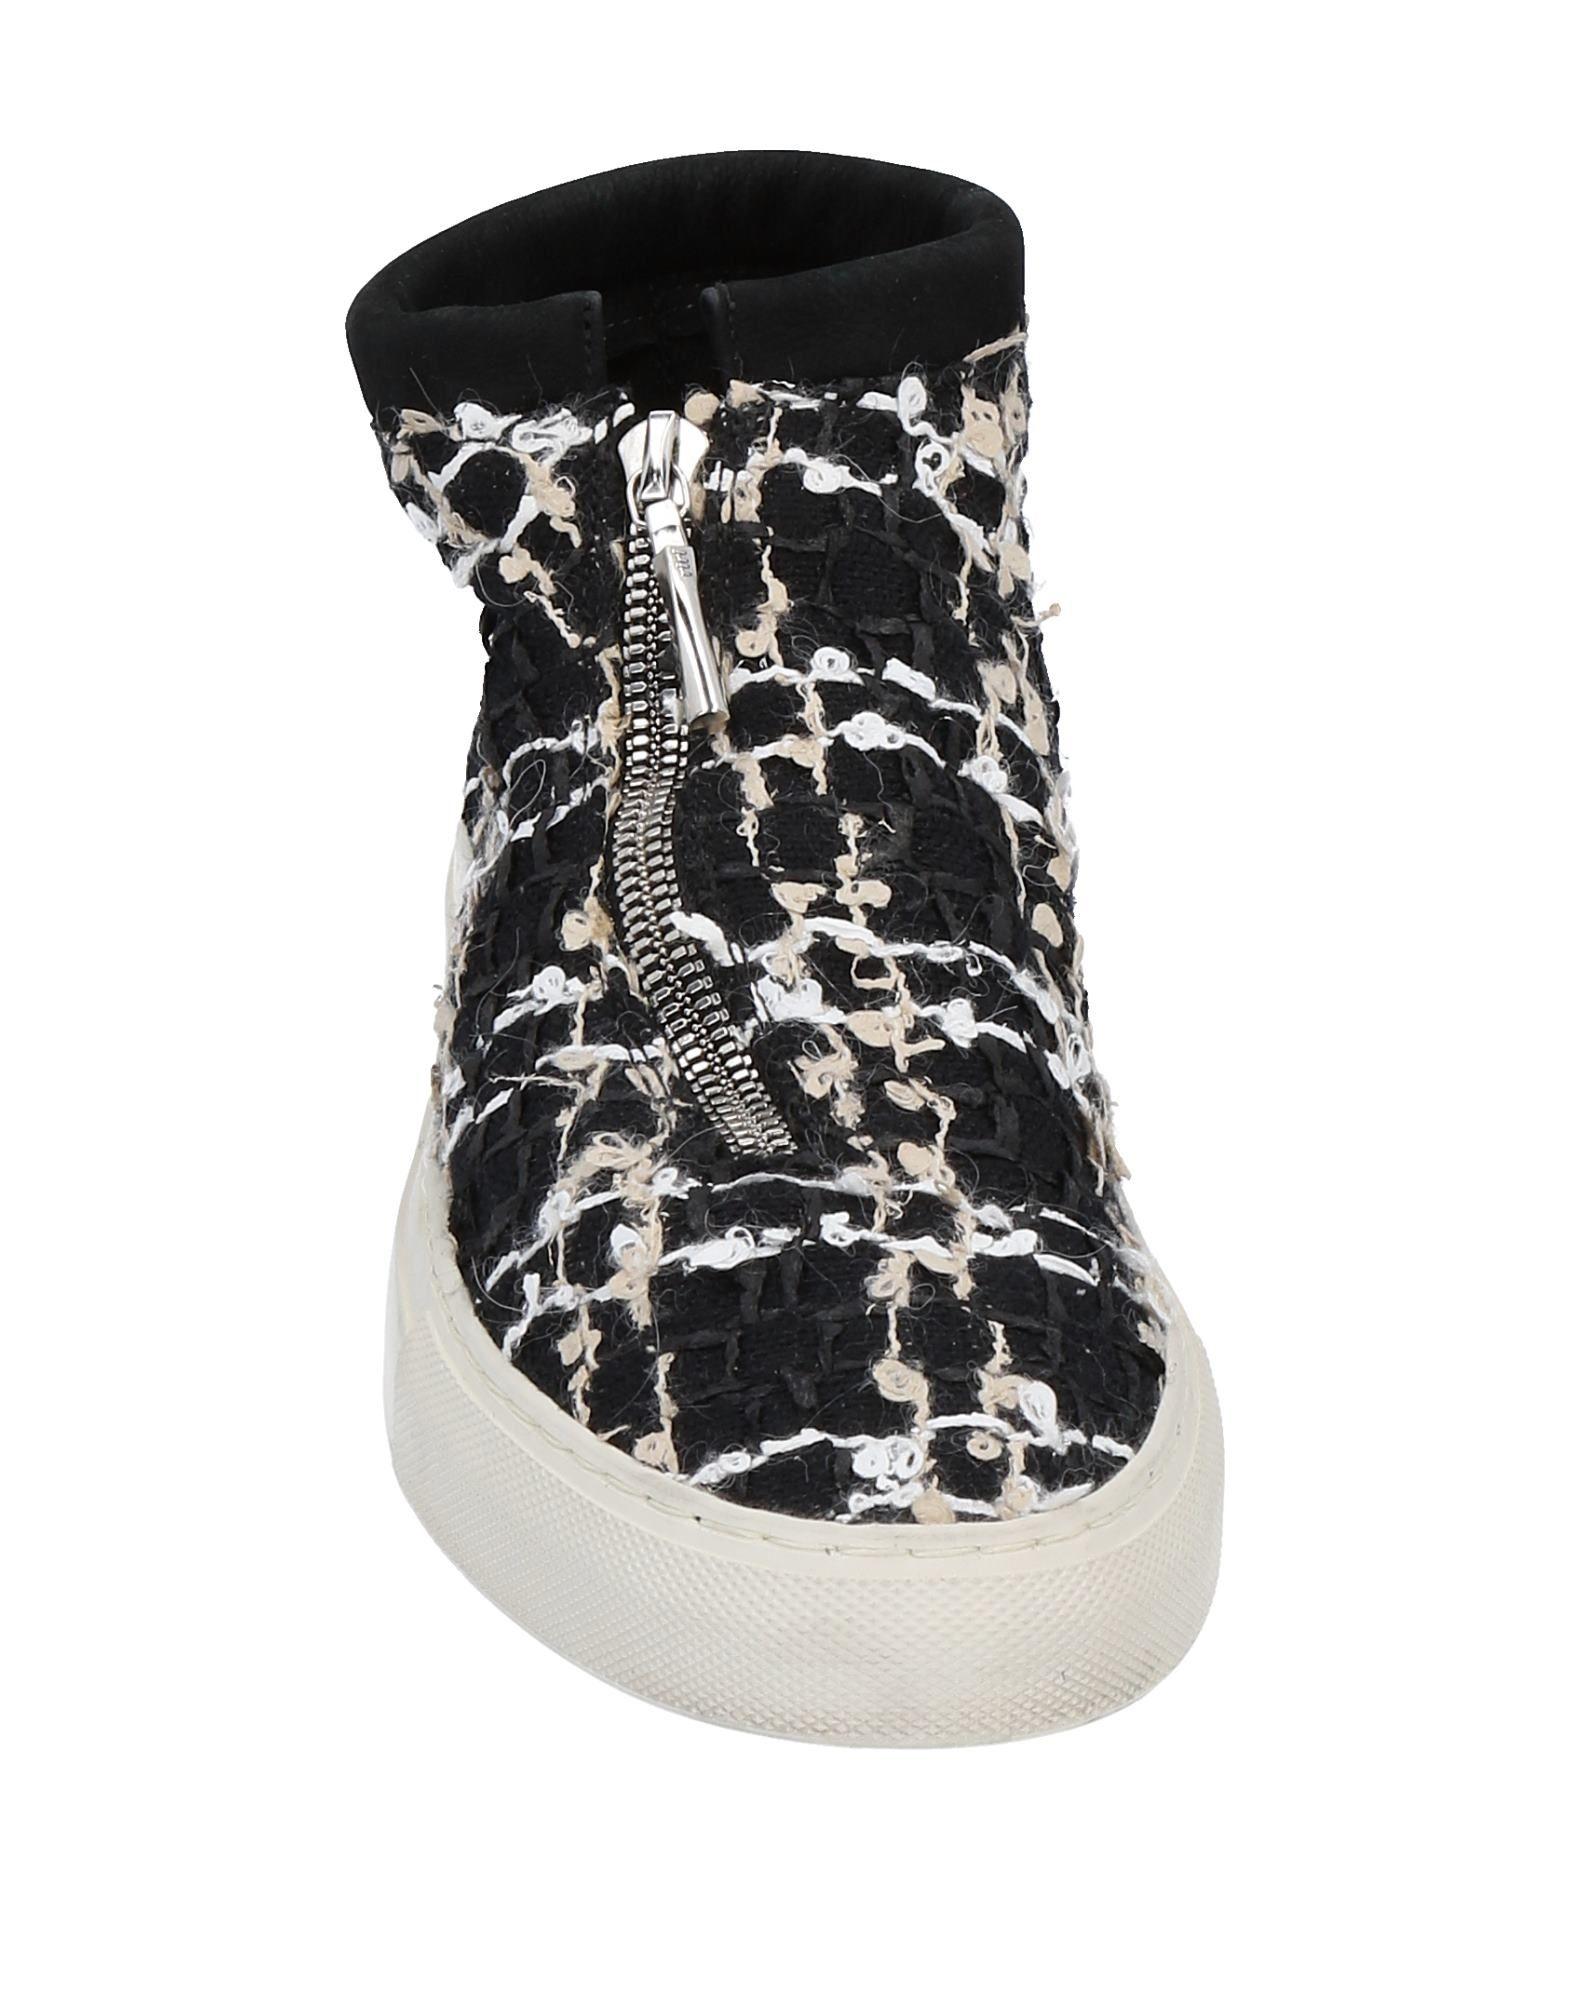 Diemme Sneakers - Women Women Women Diemme Sneakers online on  Canada - 11500611GV 9972b9